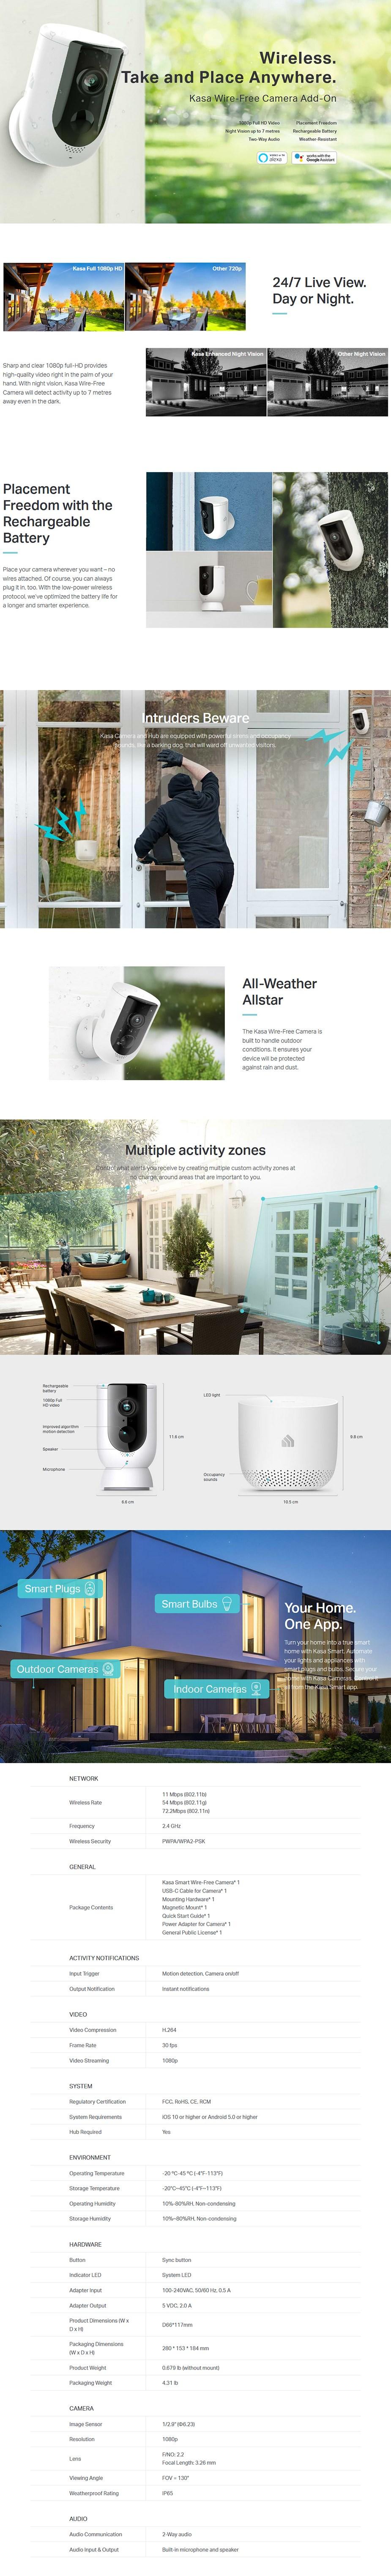 tplink-kc300-kasa-smart-wireless-fhd-camera-addon-ac41253-3.jpg